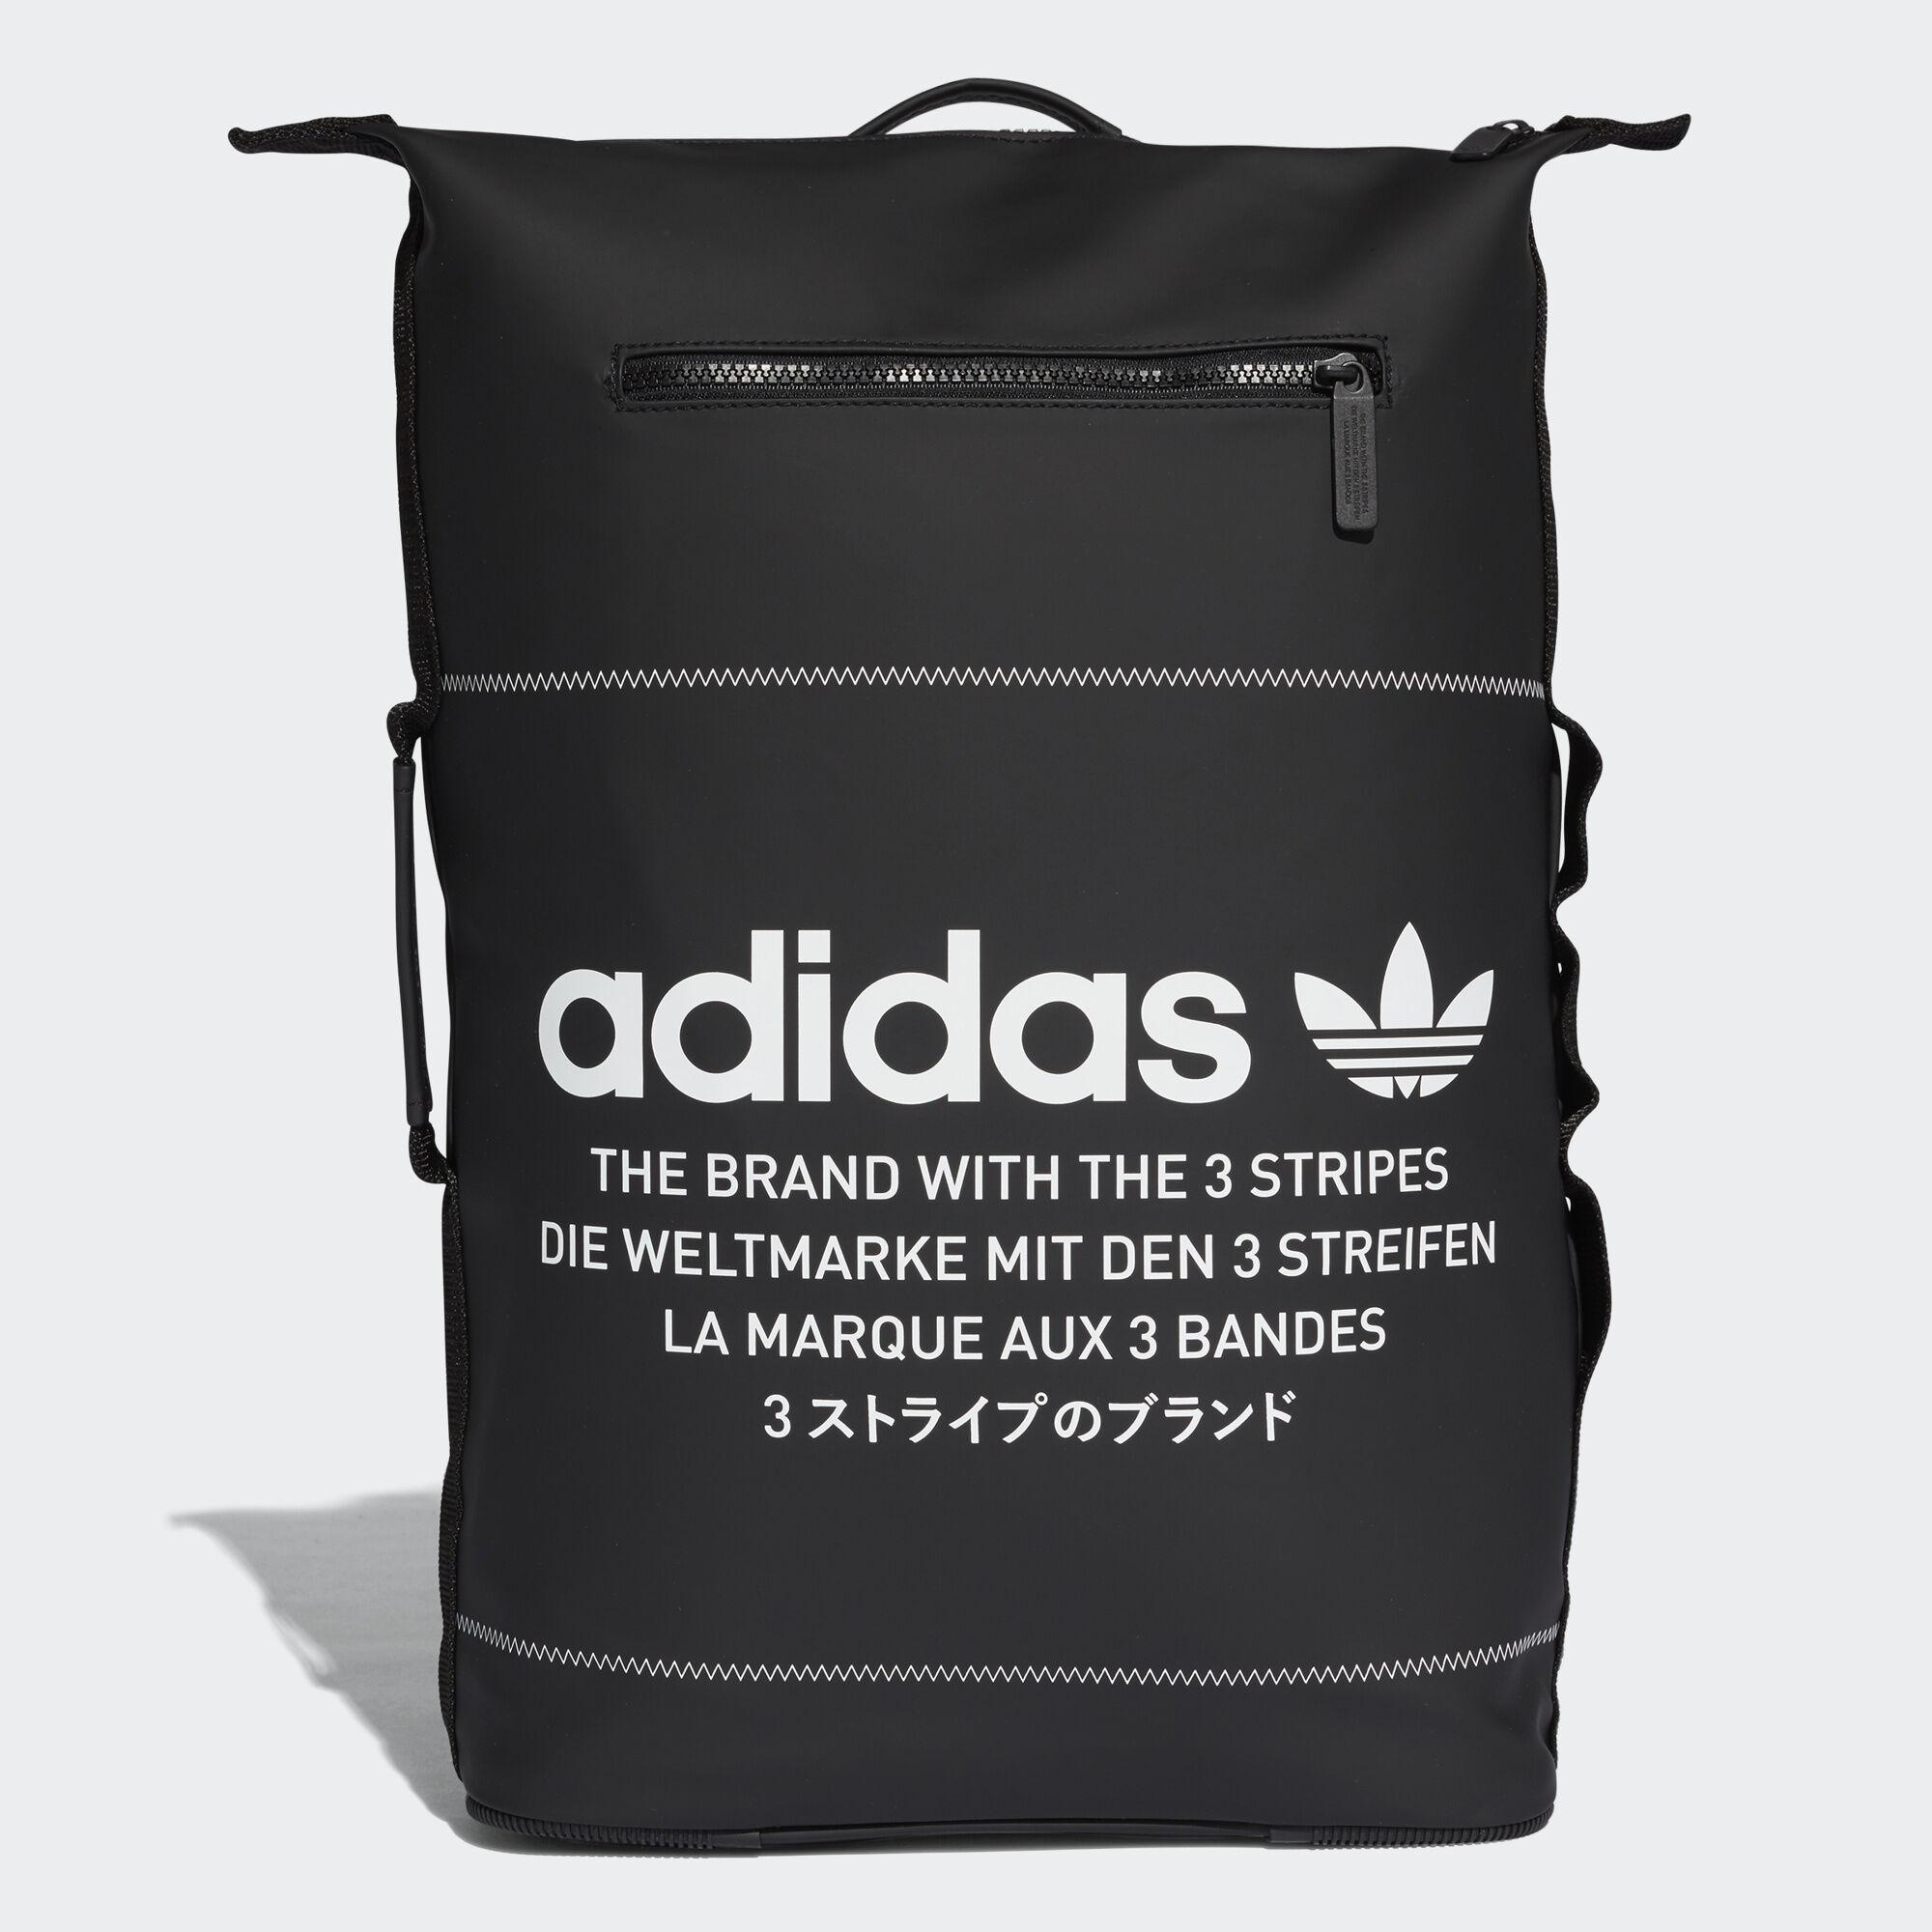 f5ccedb79e adidas - adidas NMD Backpack Black DH3097